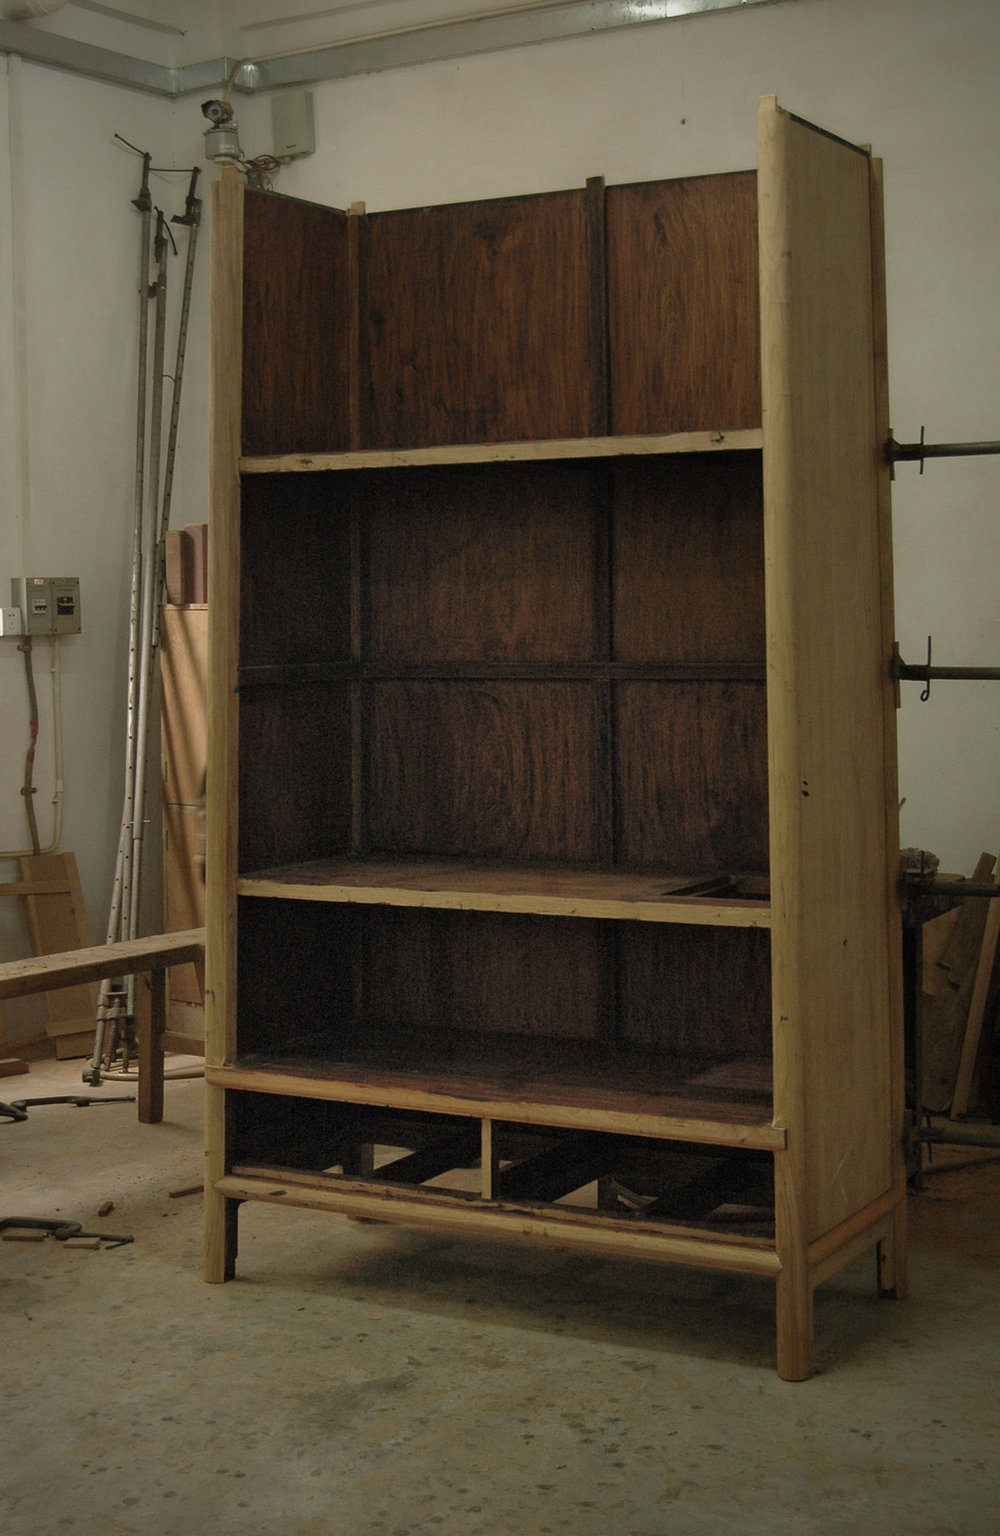 ....bespoke furniture | rosewood london : crafting photos..特别定制家具 | 瑰丽伦敦酒店:制作照片....